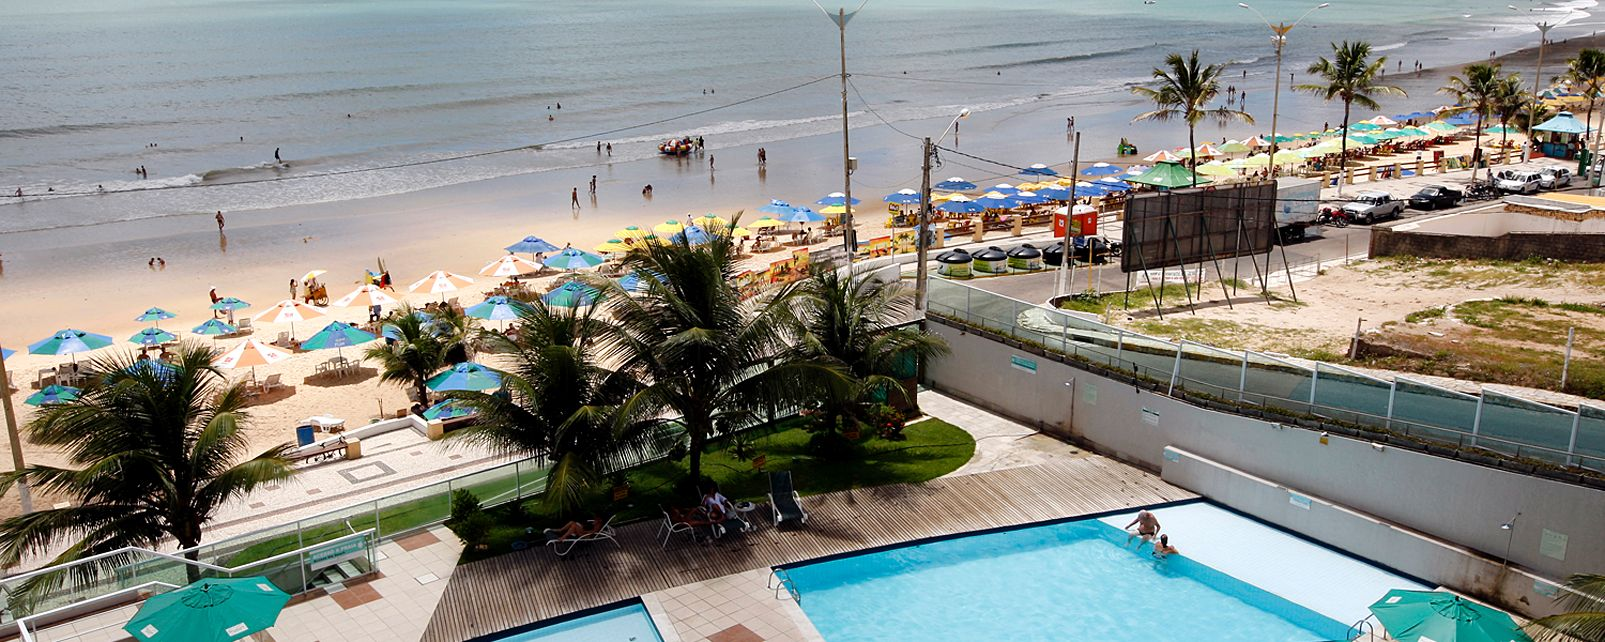 Hotel Ponta Negra Beach